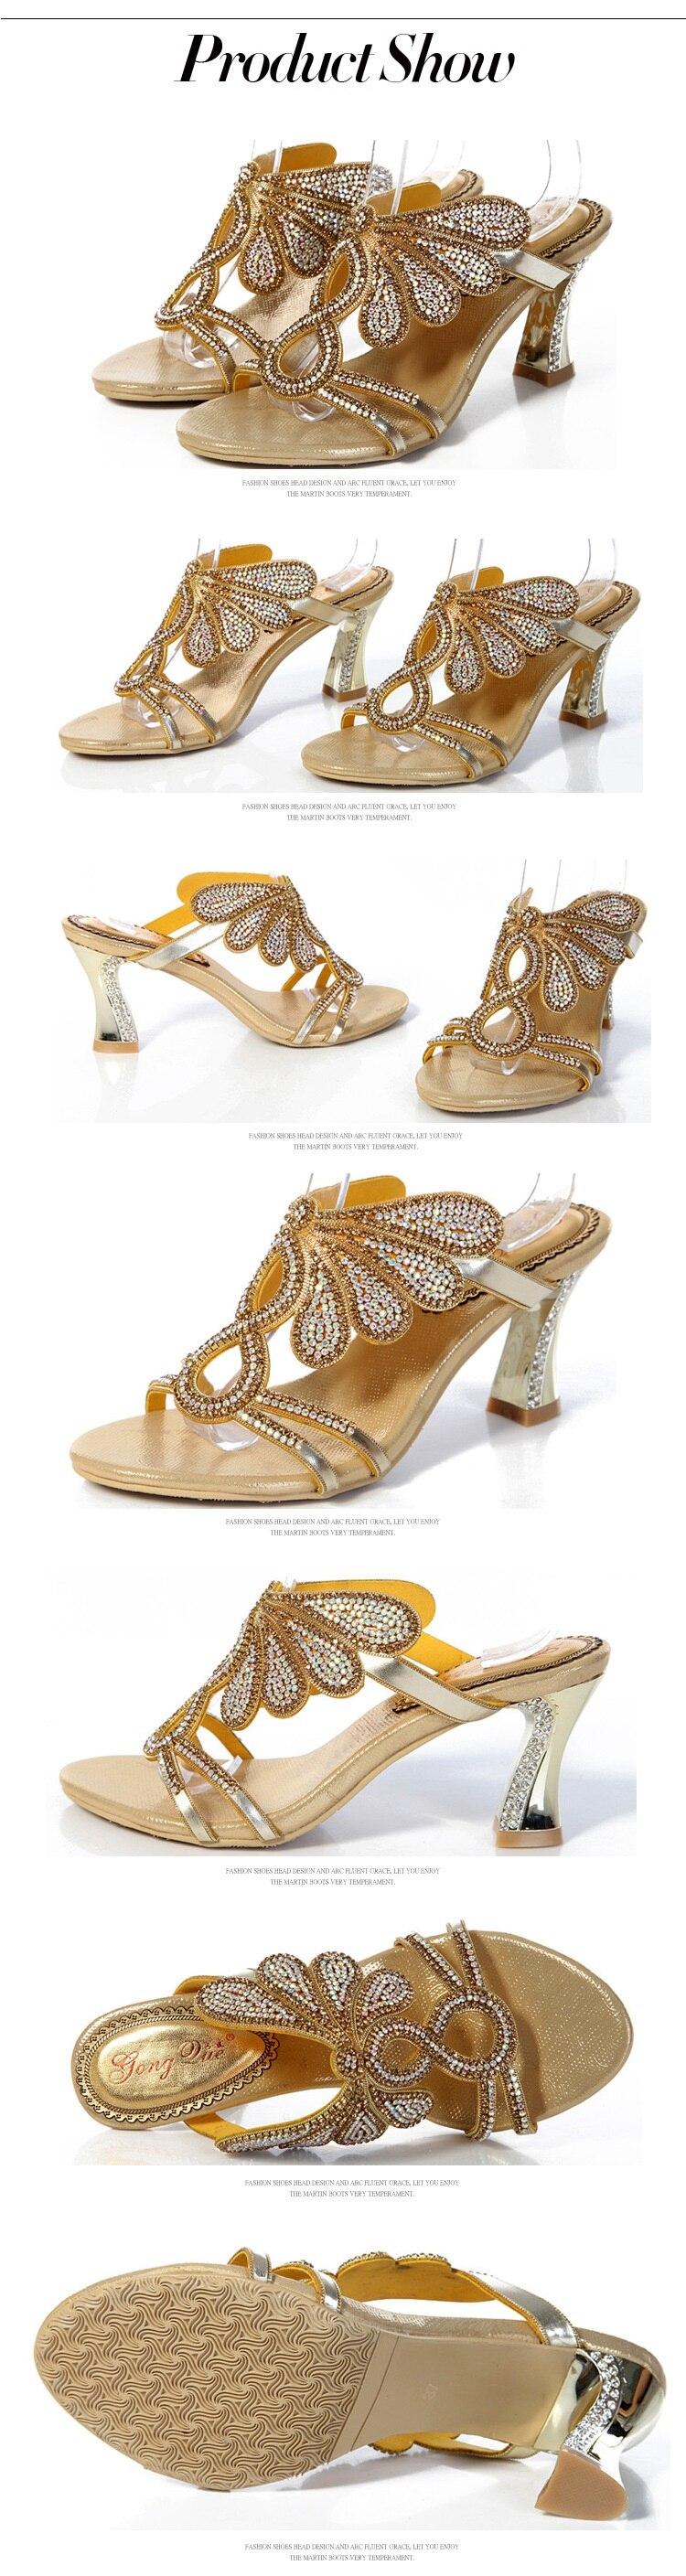 ... 2016 New Golden Luxury Diamond High Heels Slippers Online Shopping Peep  Toe Womens Shoes Sandals Sale ... e3fbc5f6ddfa